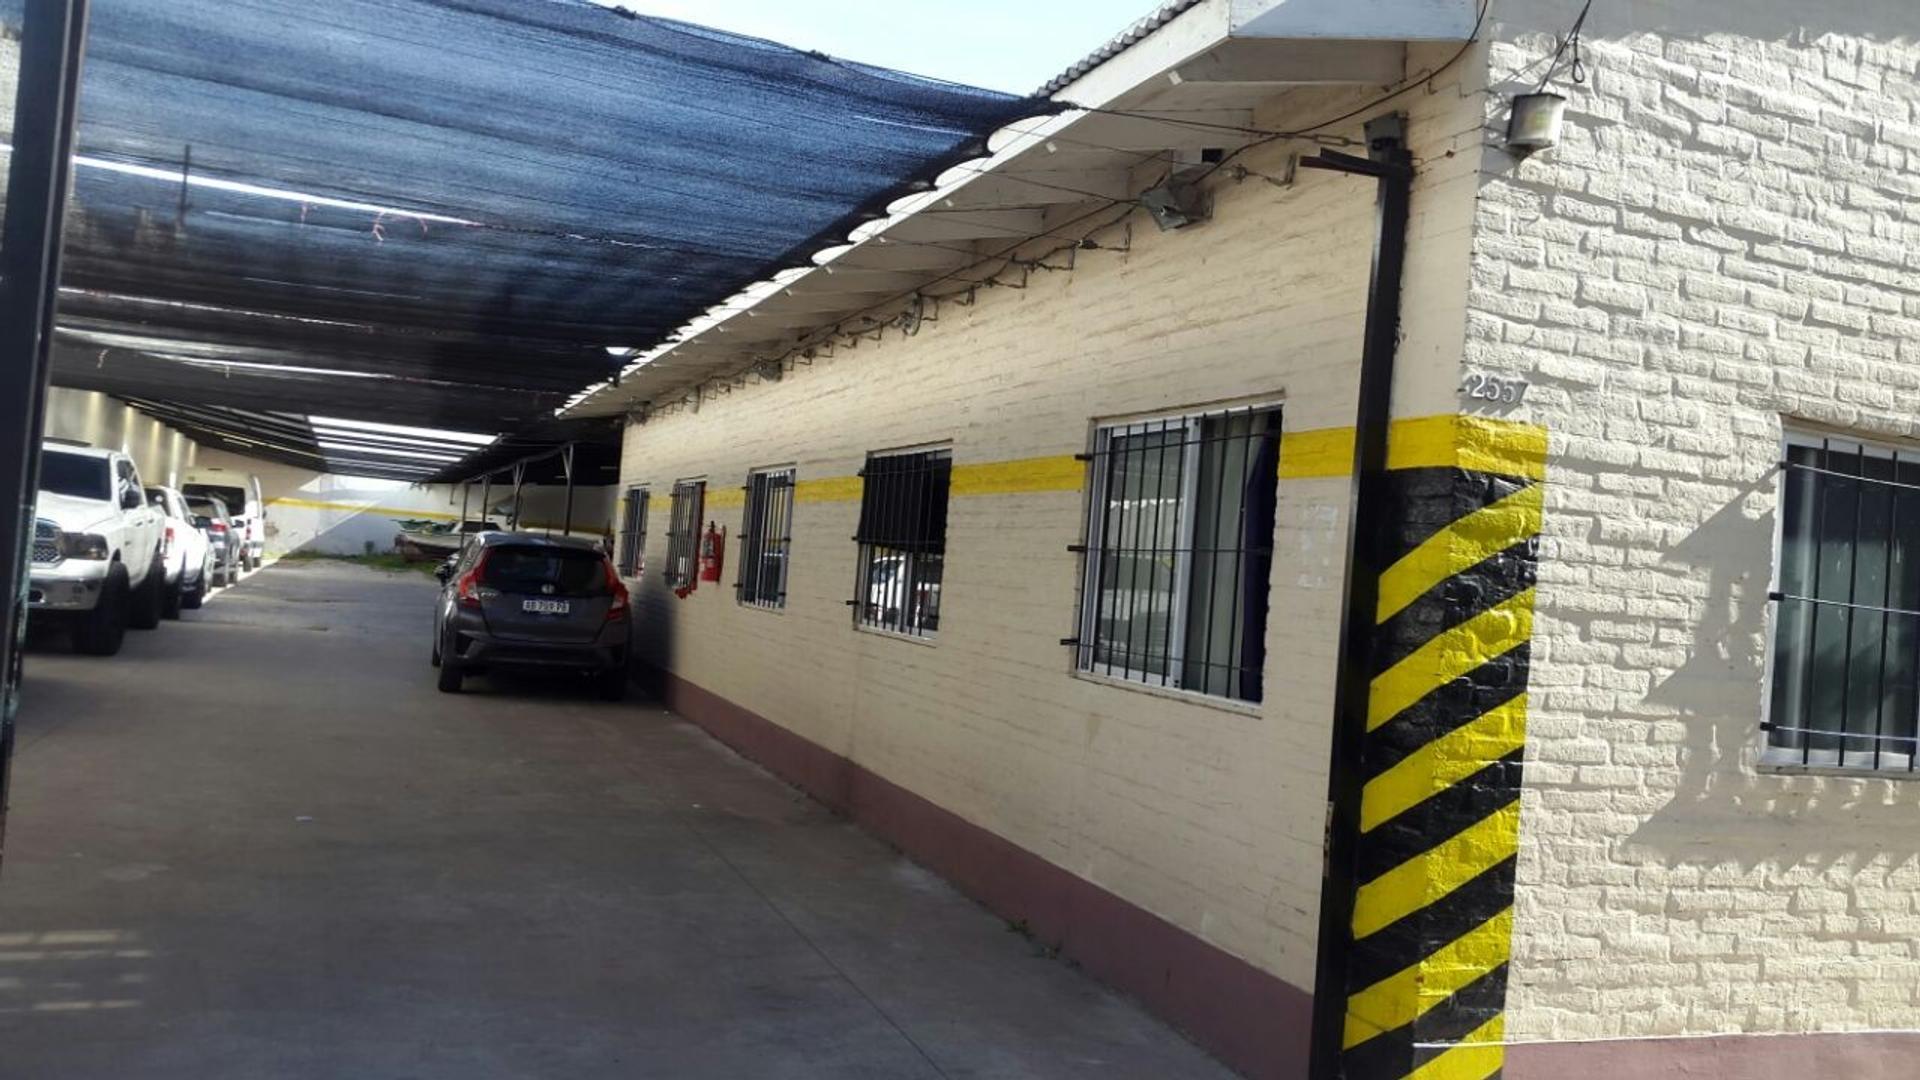 VENTA GARAJE DE 13,40 X 52,00 MTS. A 1/2 HOSPITAL ALVAREZ,  EN ZONA FLORES. CONSULTE